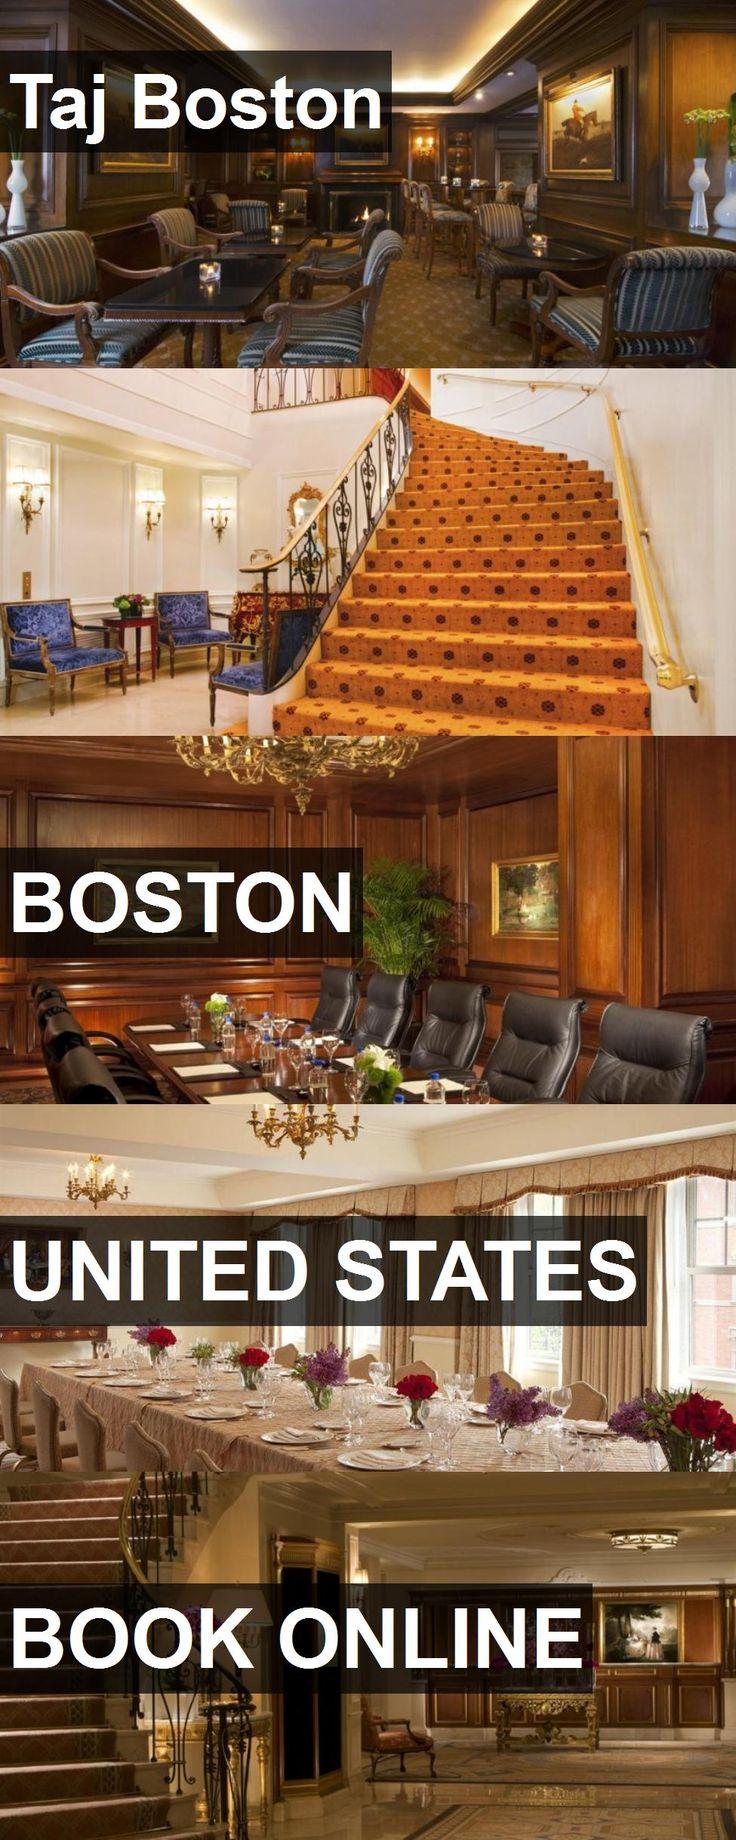 Hotel Taj Boston in Boston, United States. For more information, photos, reviews and best prices please follow the link. #UnitedStates #Boston #TajBoston #hotel #travel #vacation